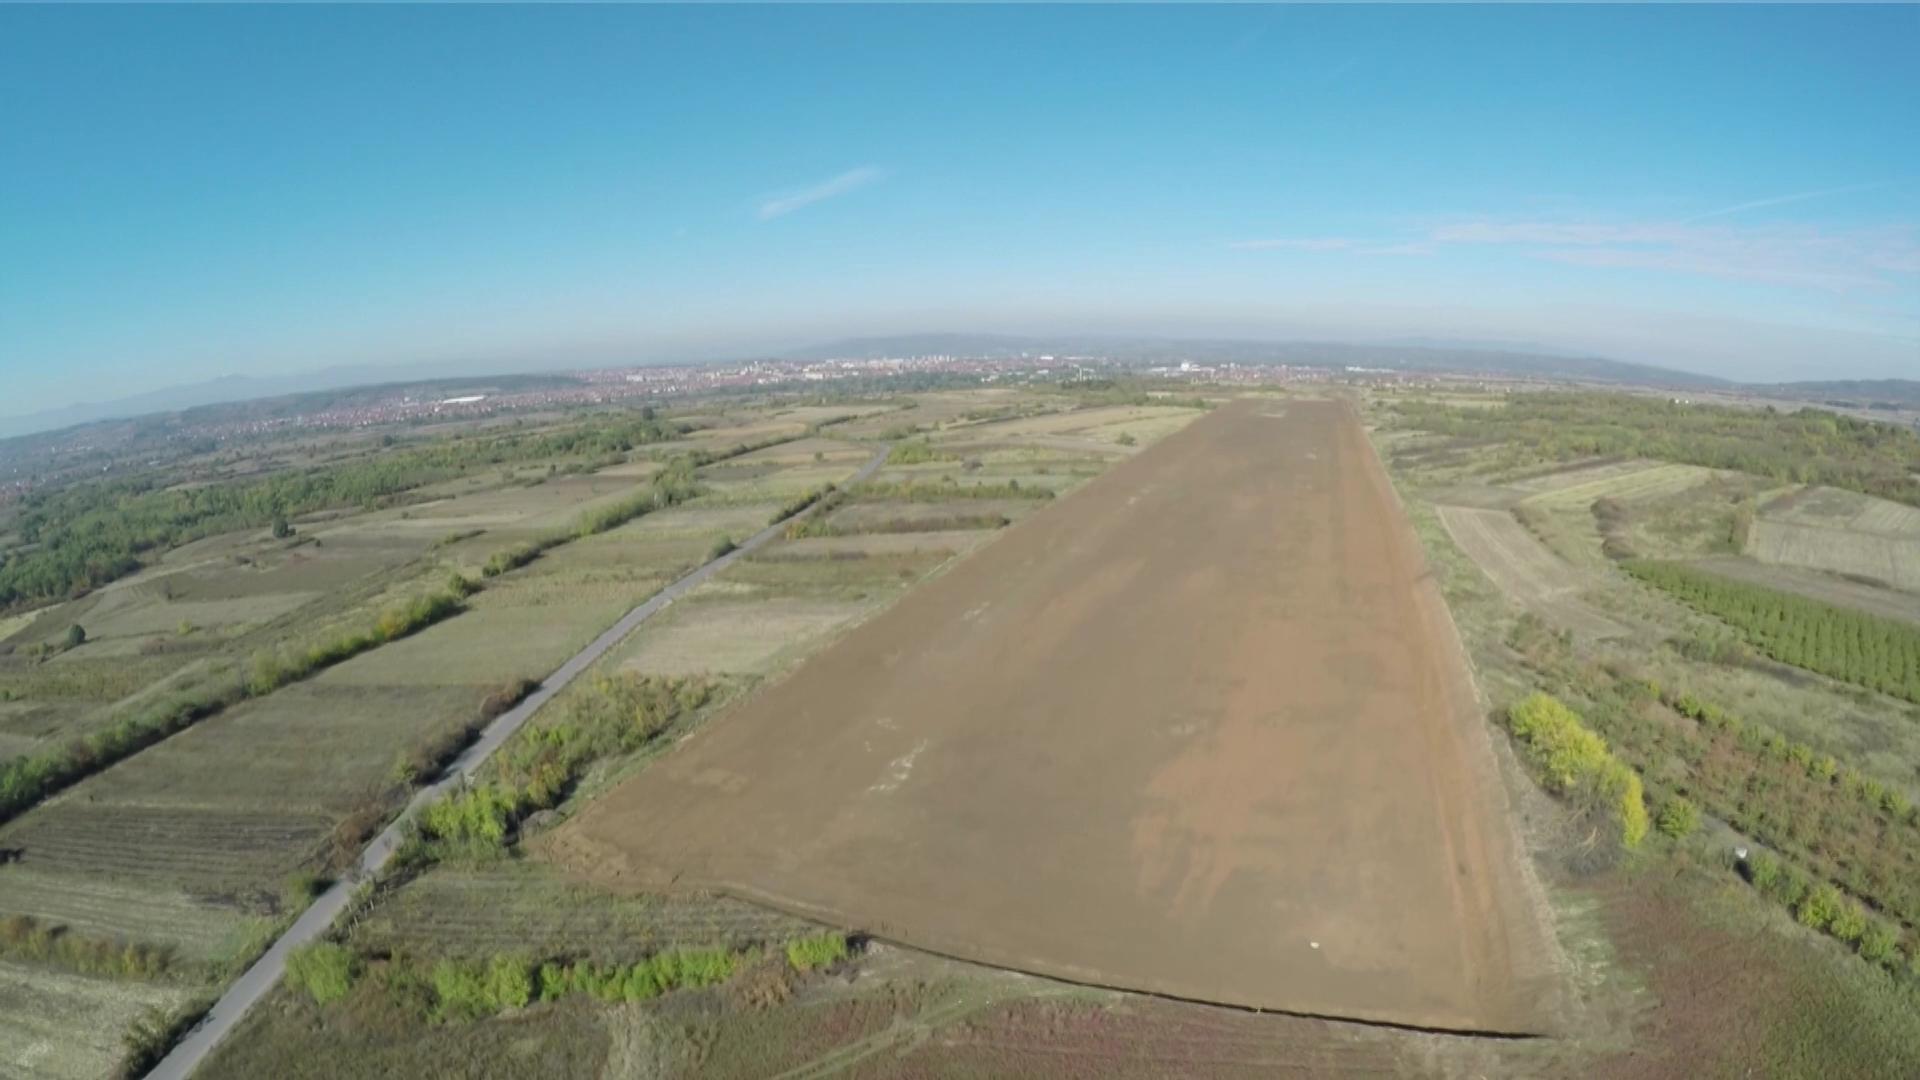 Kapitalna investicija izgradnje Aerodroma Rusulje nastavlja se izgradnjom hangara i poletno slethih staza